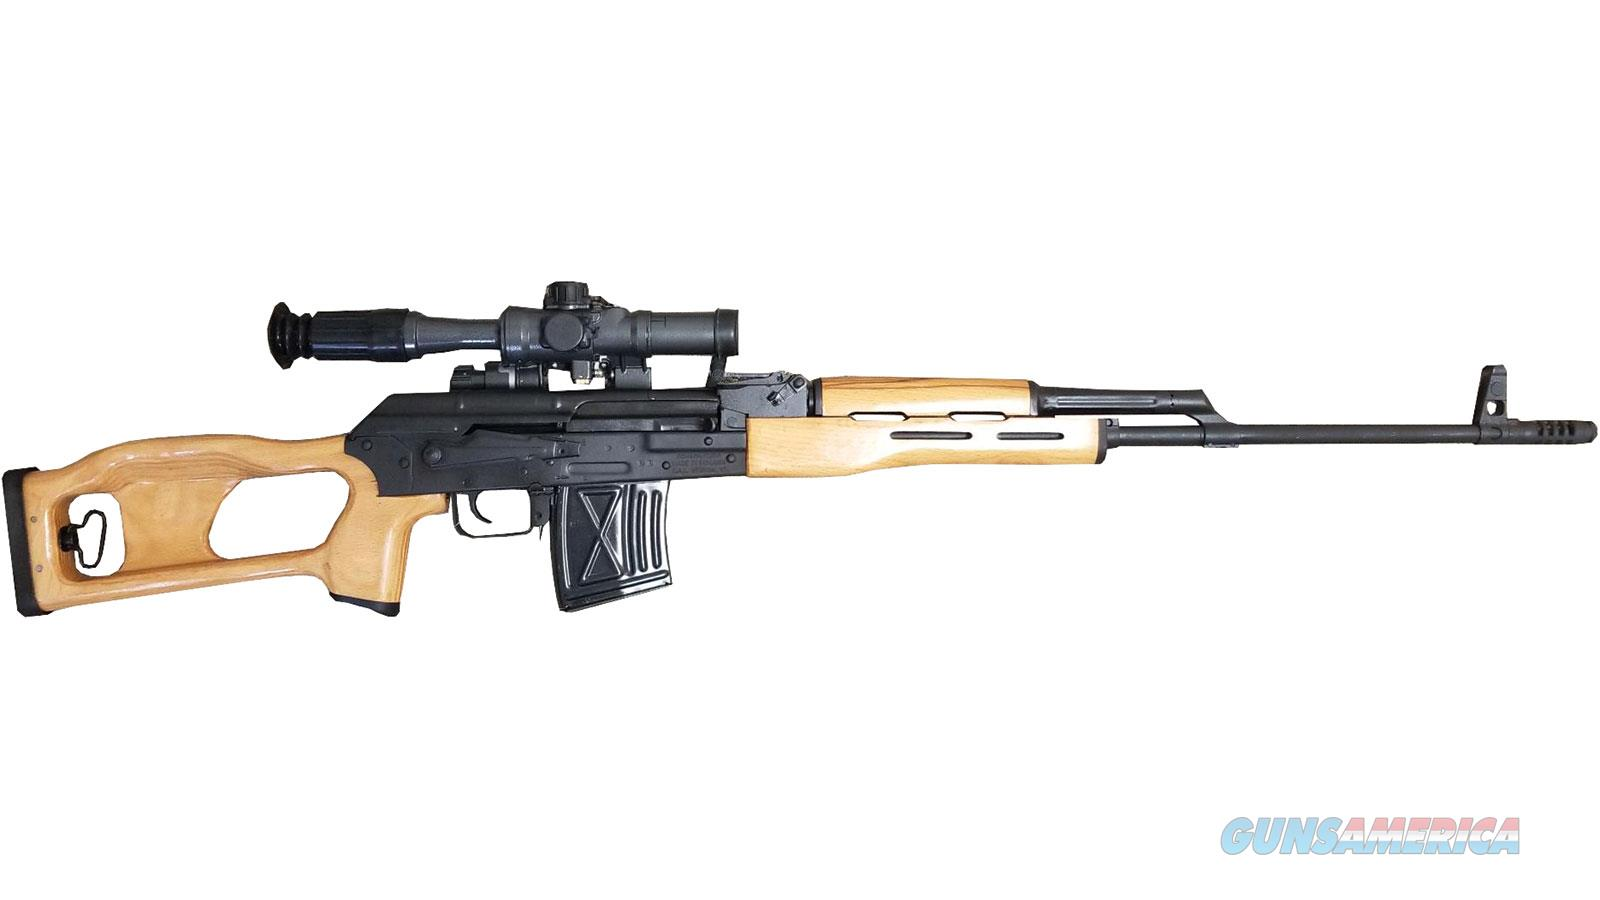 "Century Arms Cent Arms Psl54 762X54r 24"" 10Rd RI3324-N  Guns > Rifles > C Misc Rifles"